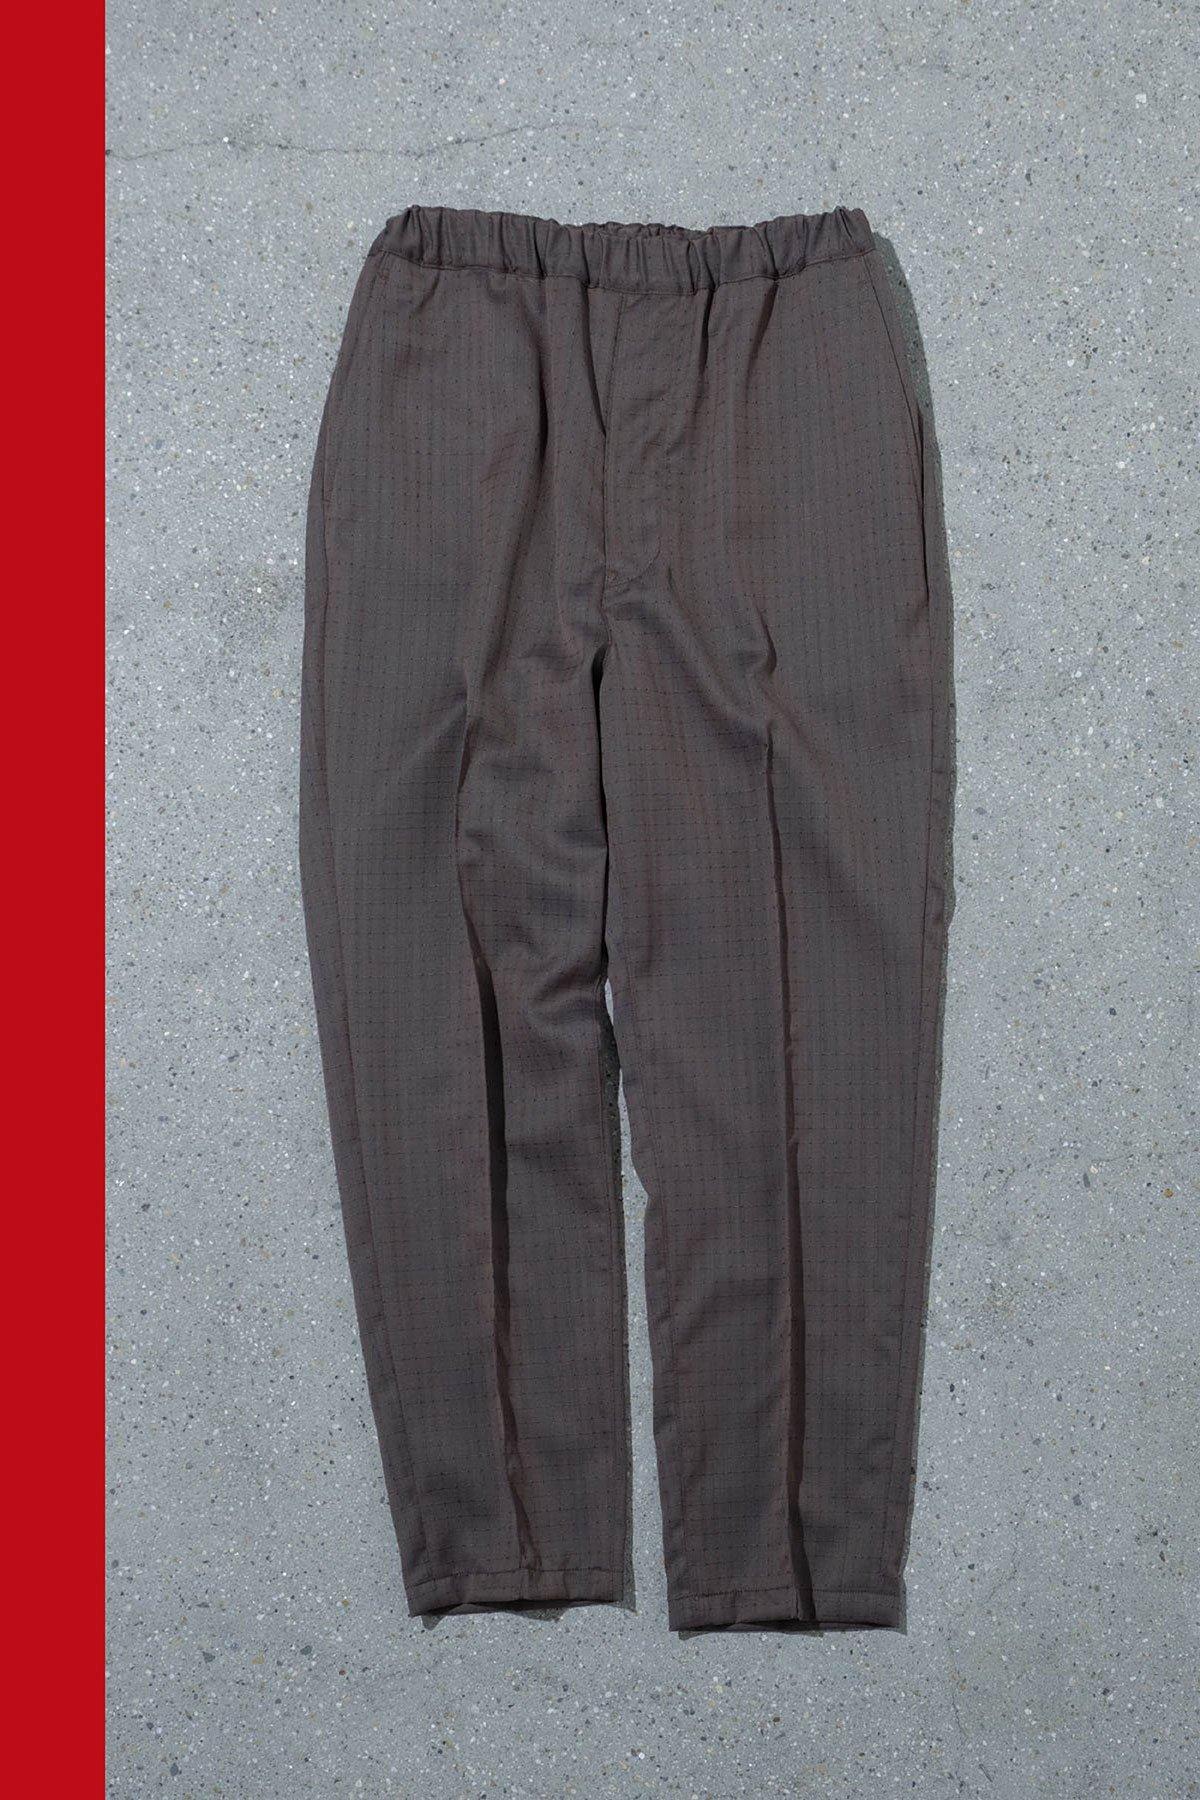 WELLDER / Drawstring Trousers(Women's)